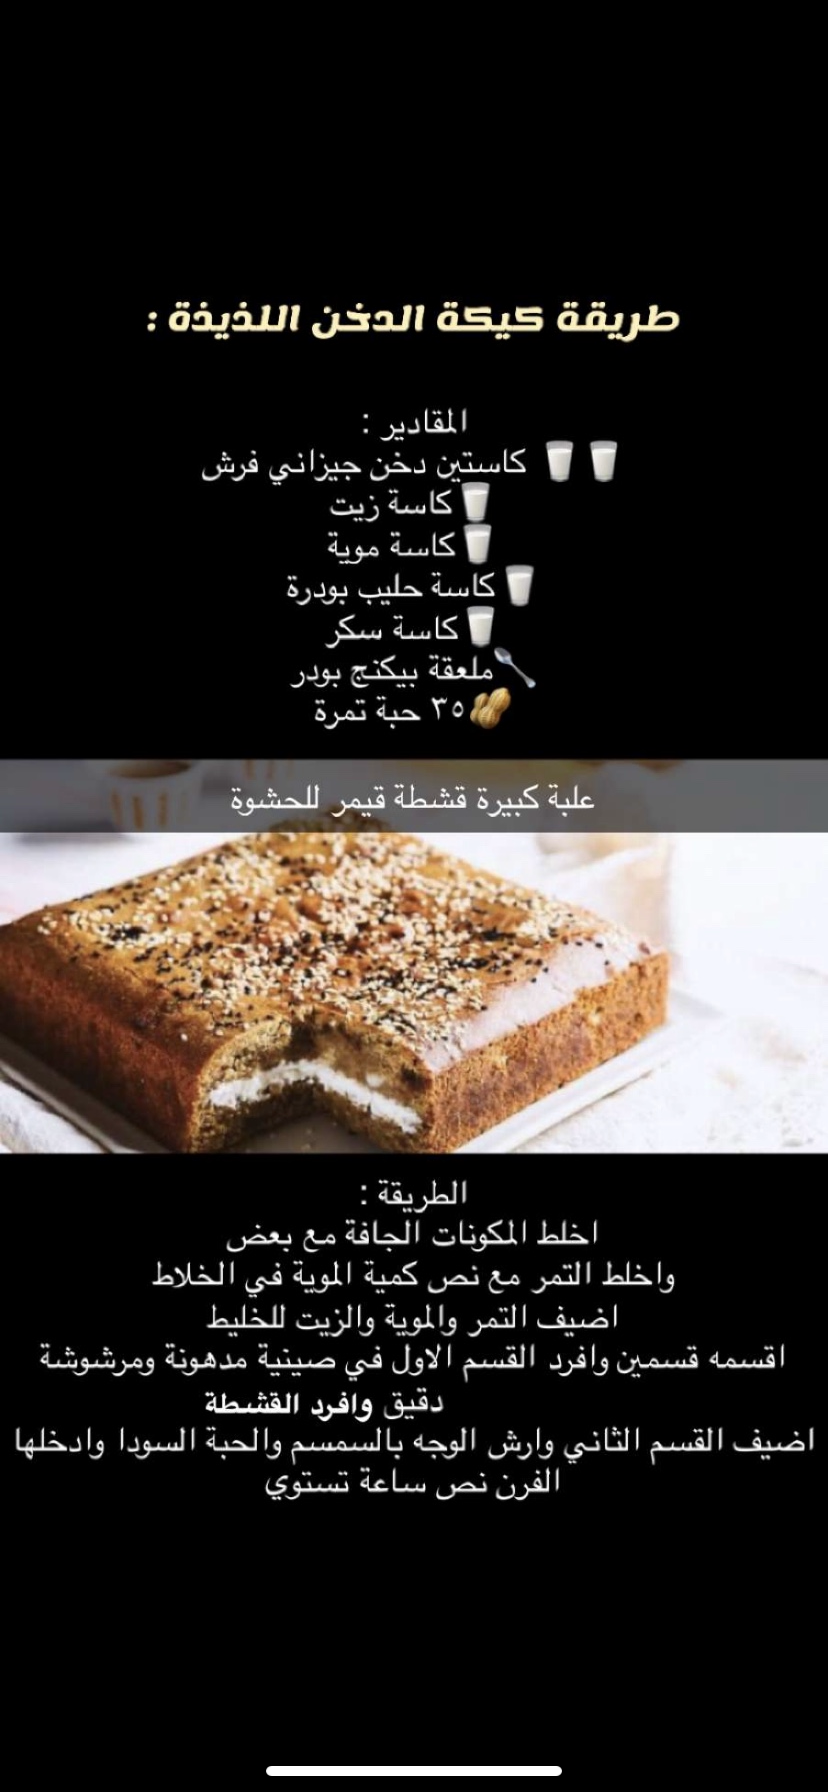 كيكه دخن Dessert Recipes Recipes Arabic Food